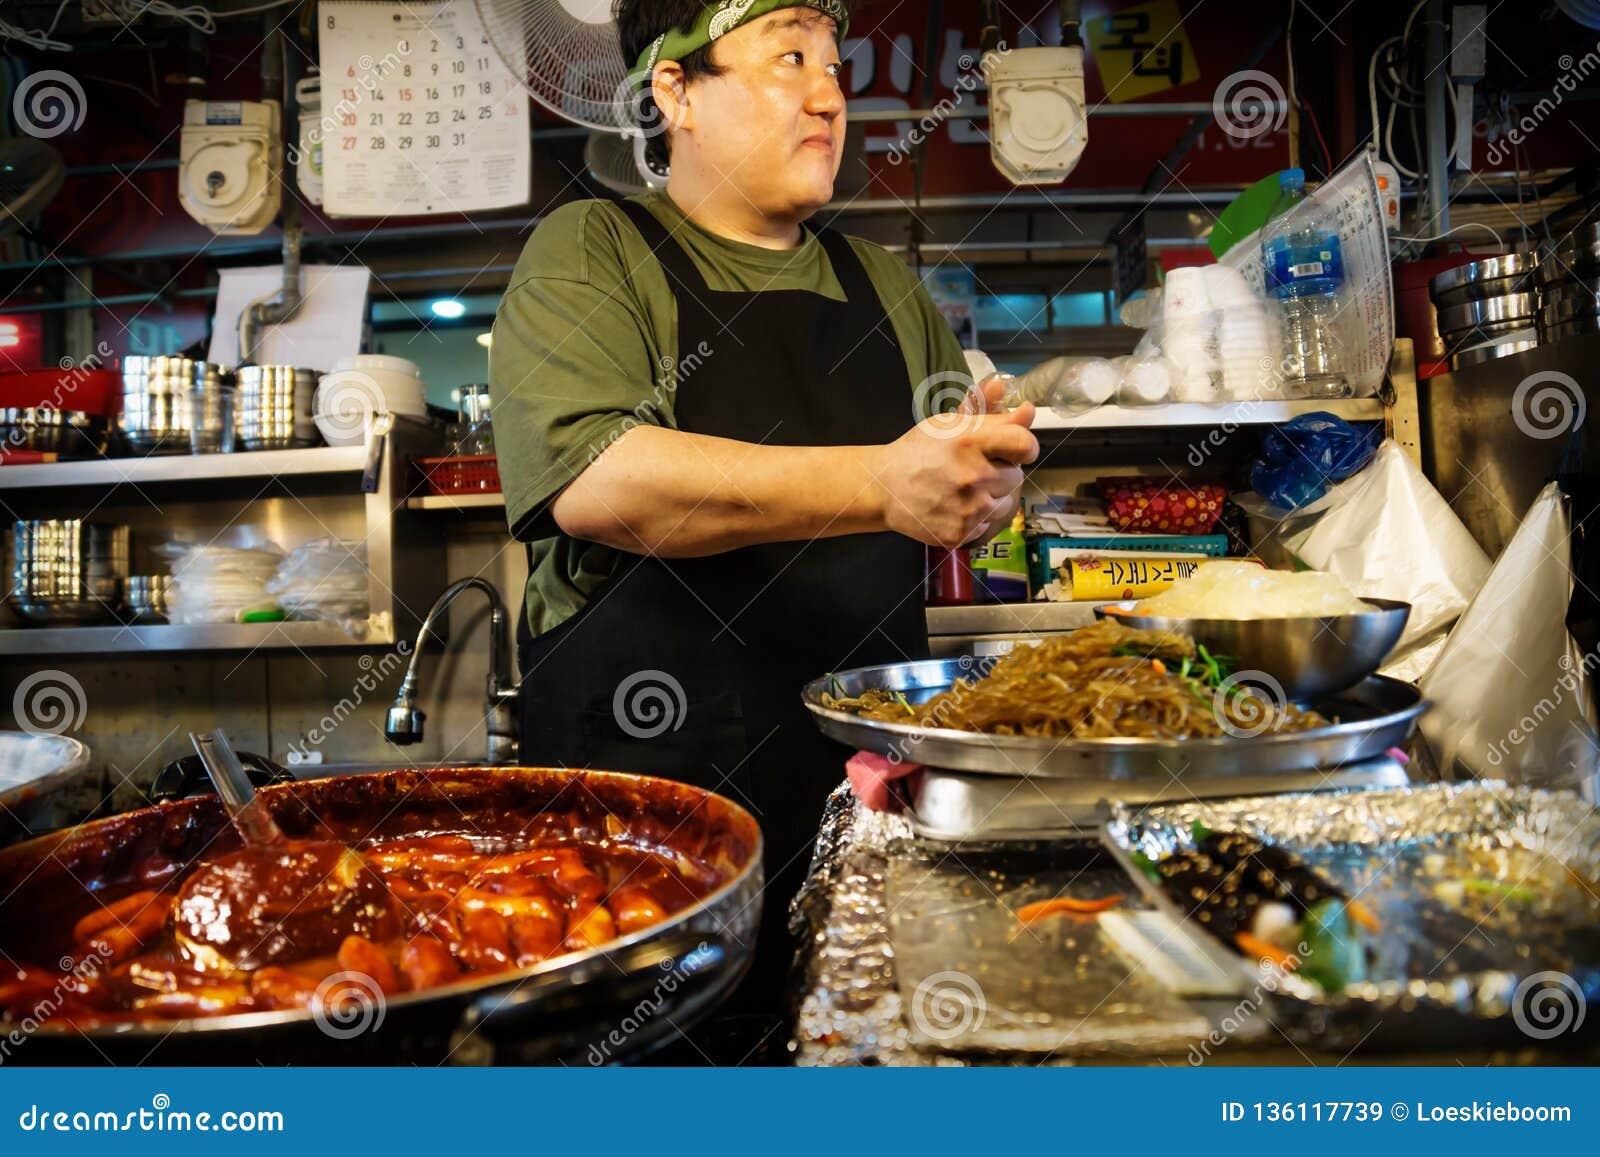 Cook at a street food stall in Gwanjang Market, Seoul, South Korea